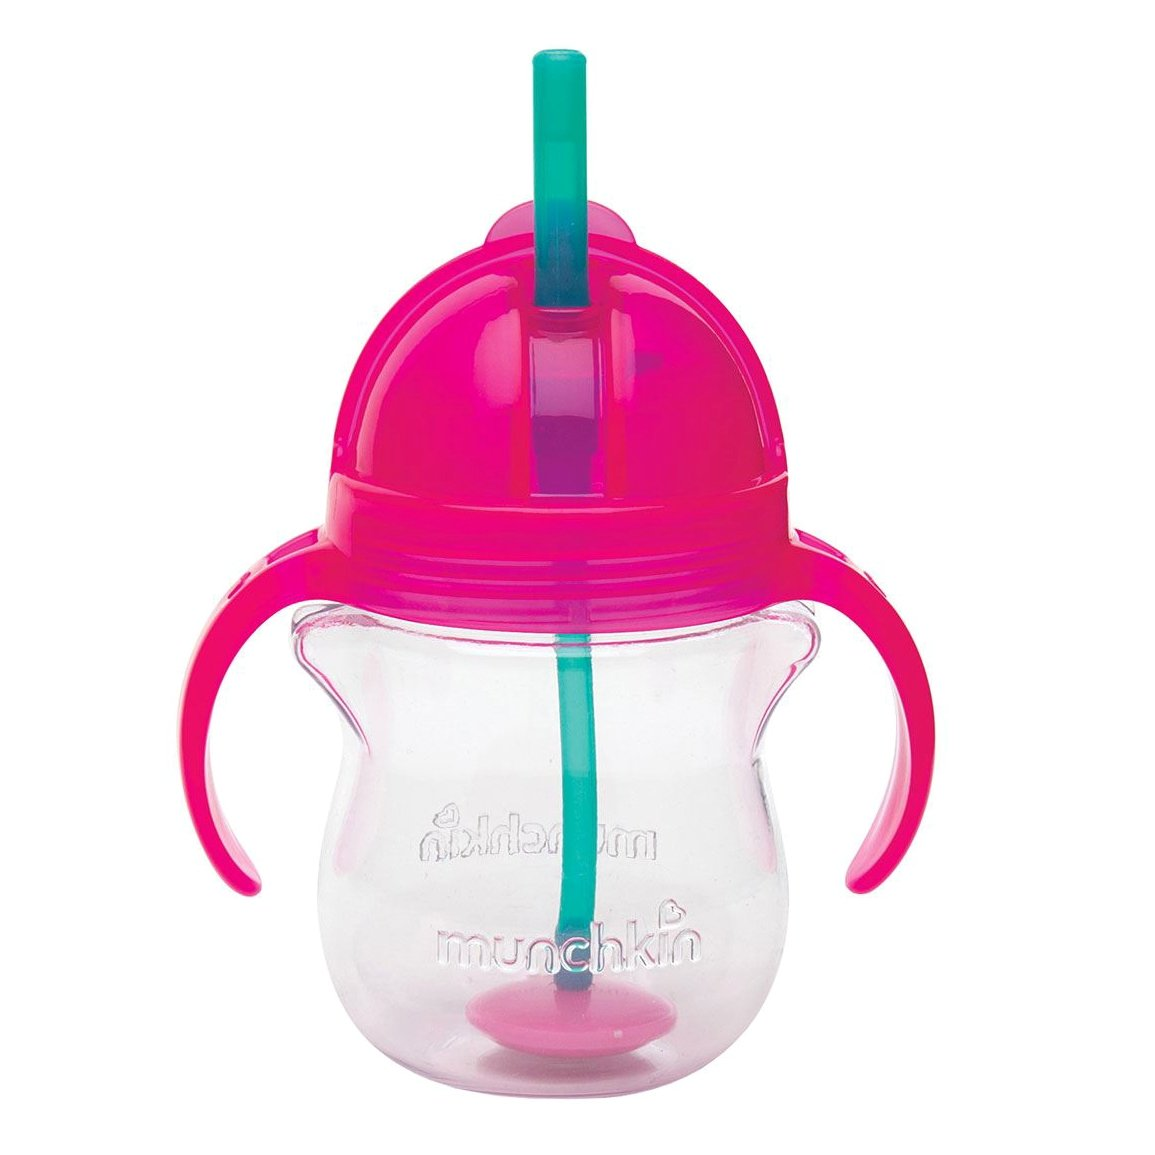 Munchkin Click Lock Tip & Sip Straw Cup Ποτήρι με Ευέλικτο Καλαμάκι 6m+, 207ml – ροζ